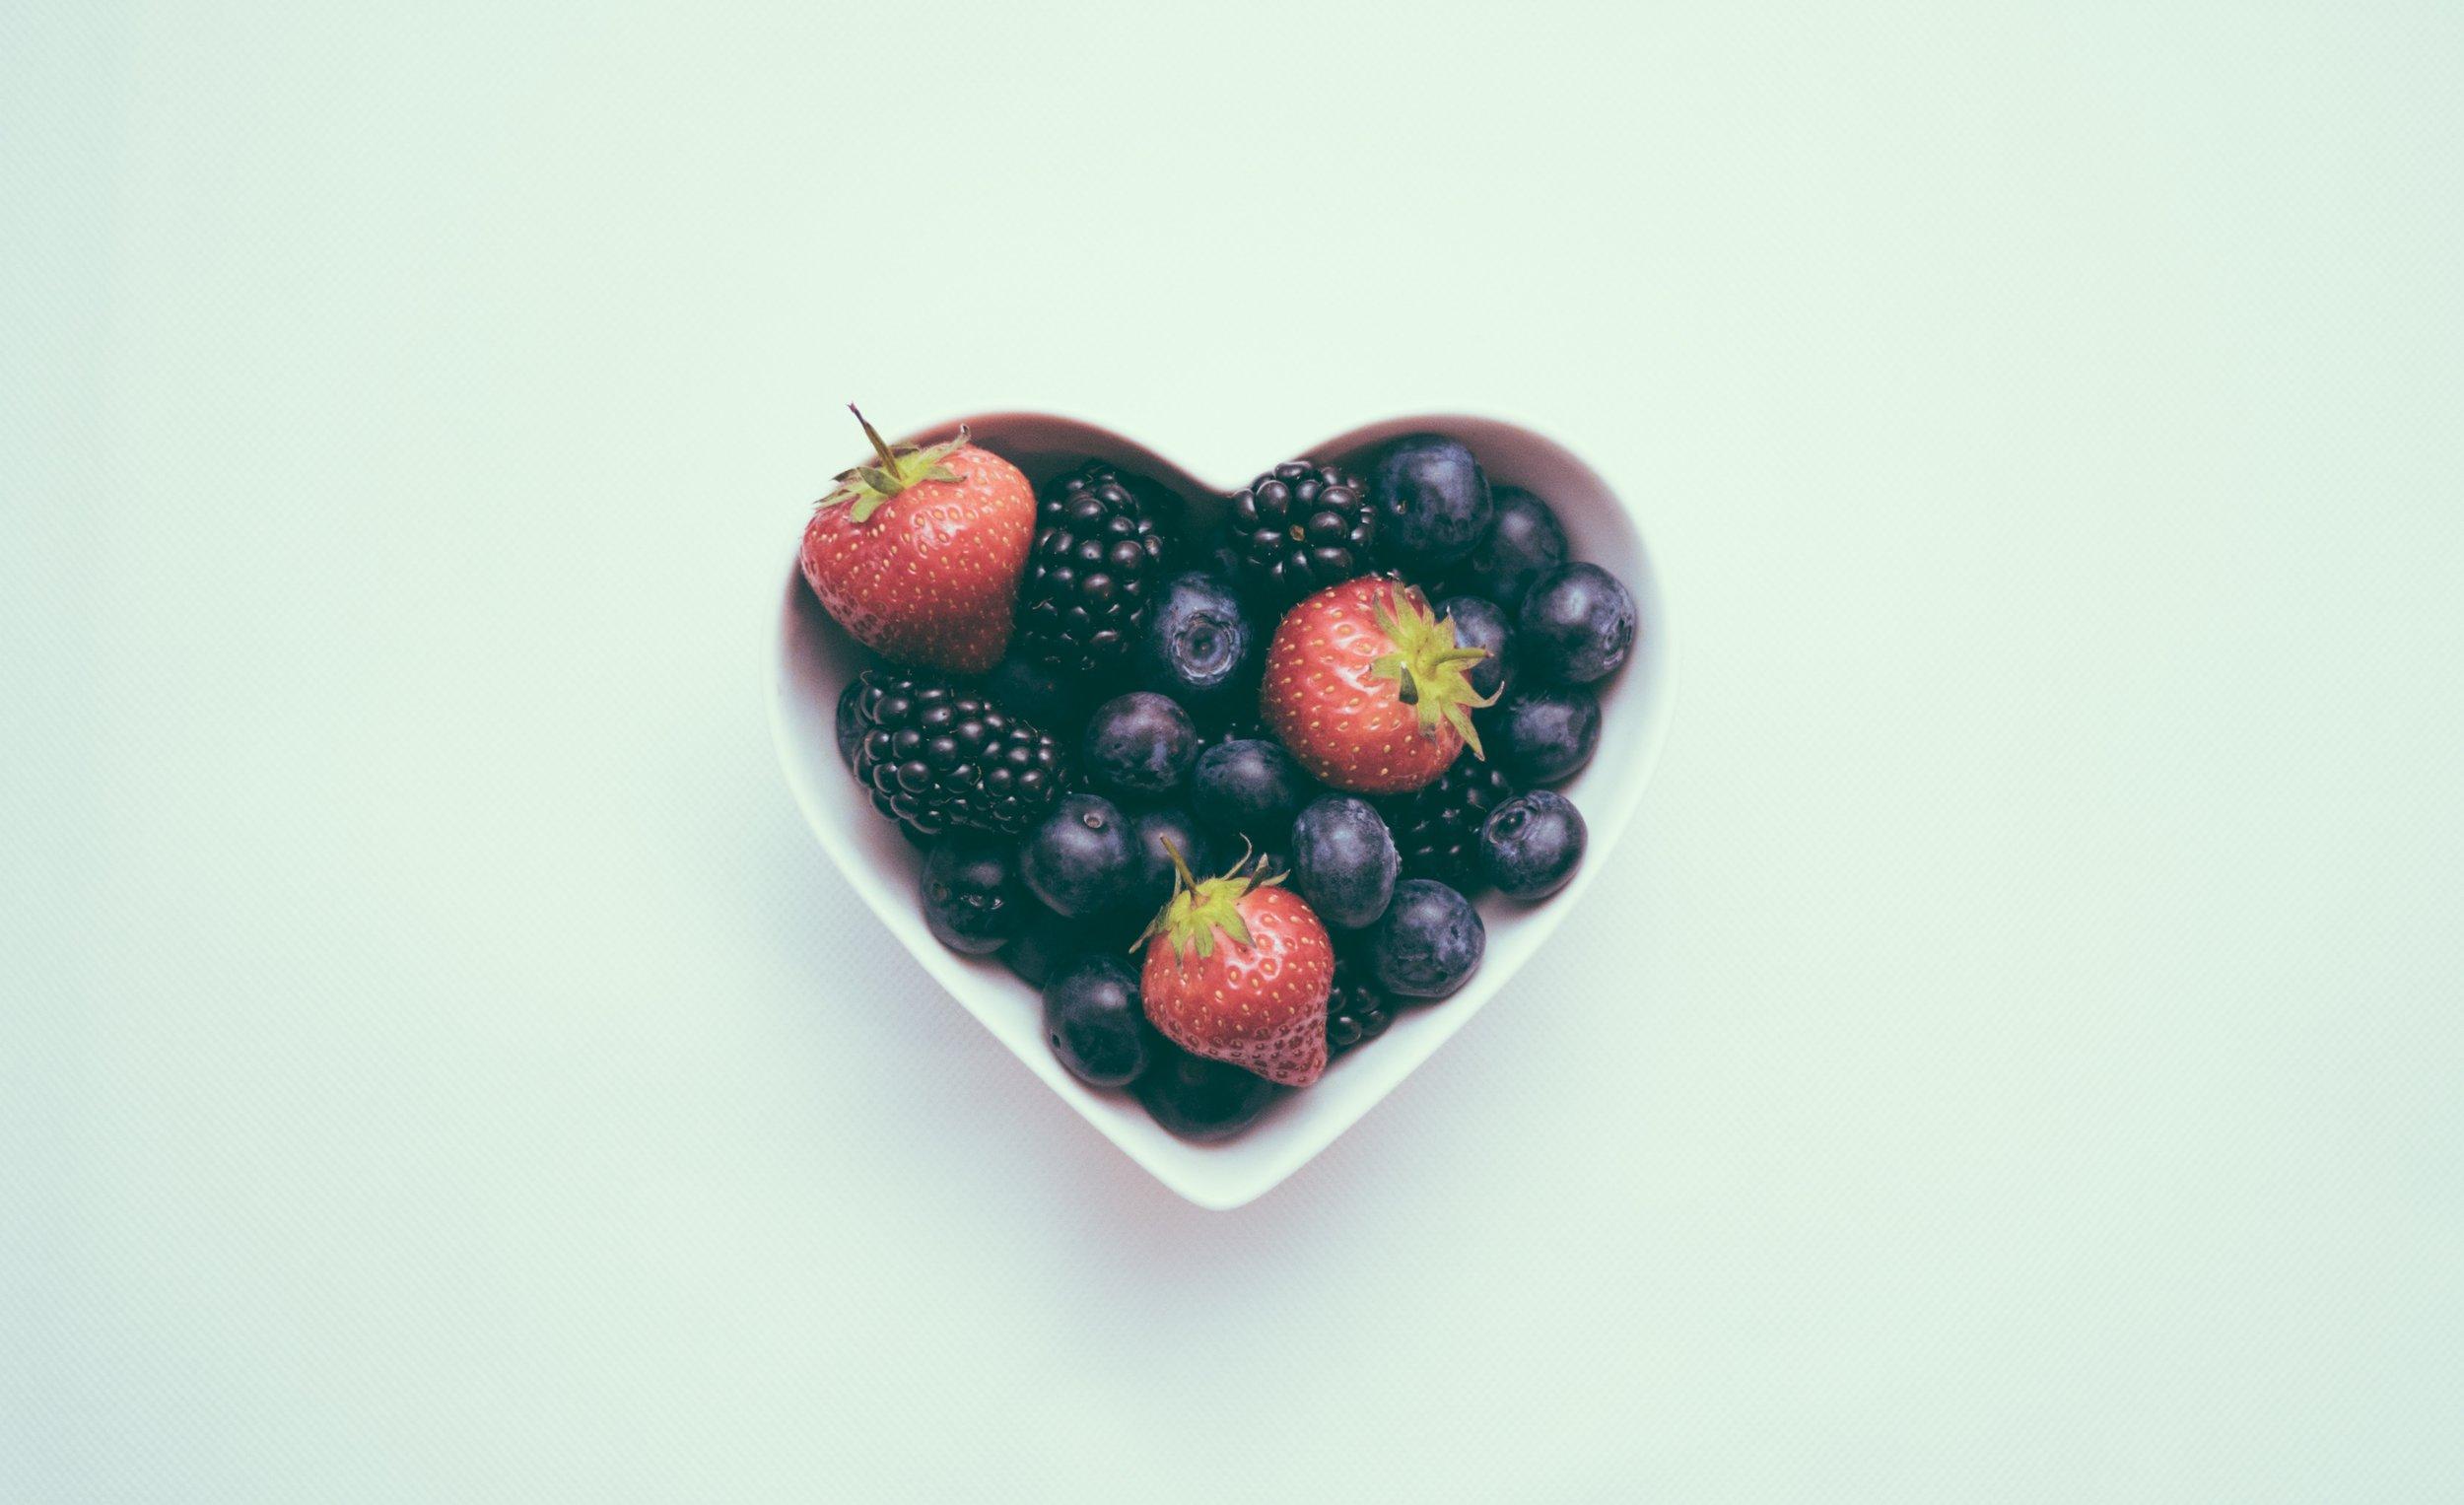 Overture nutrition